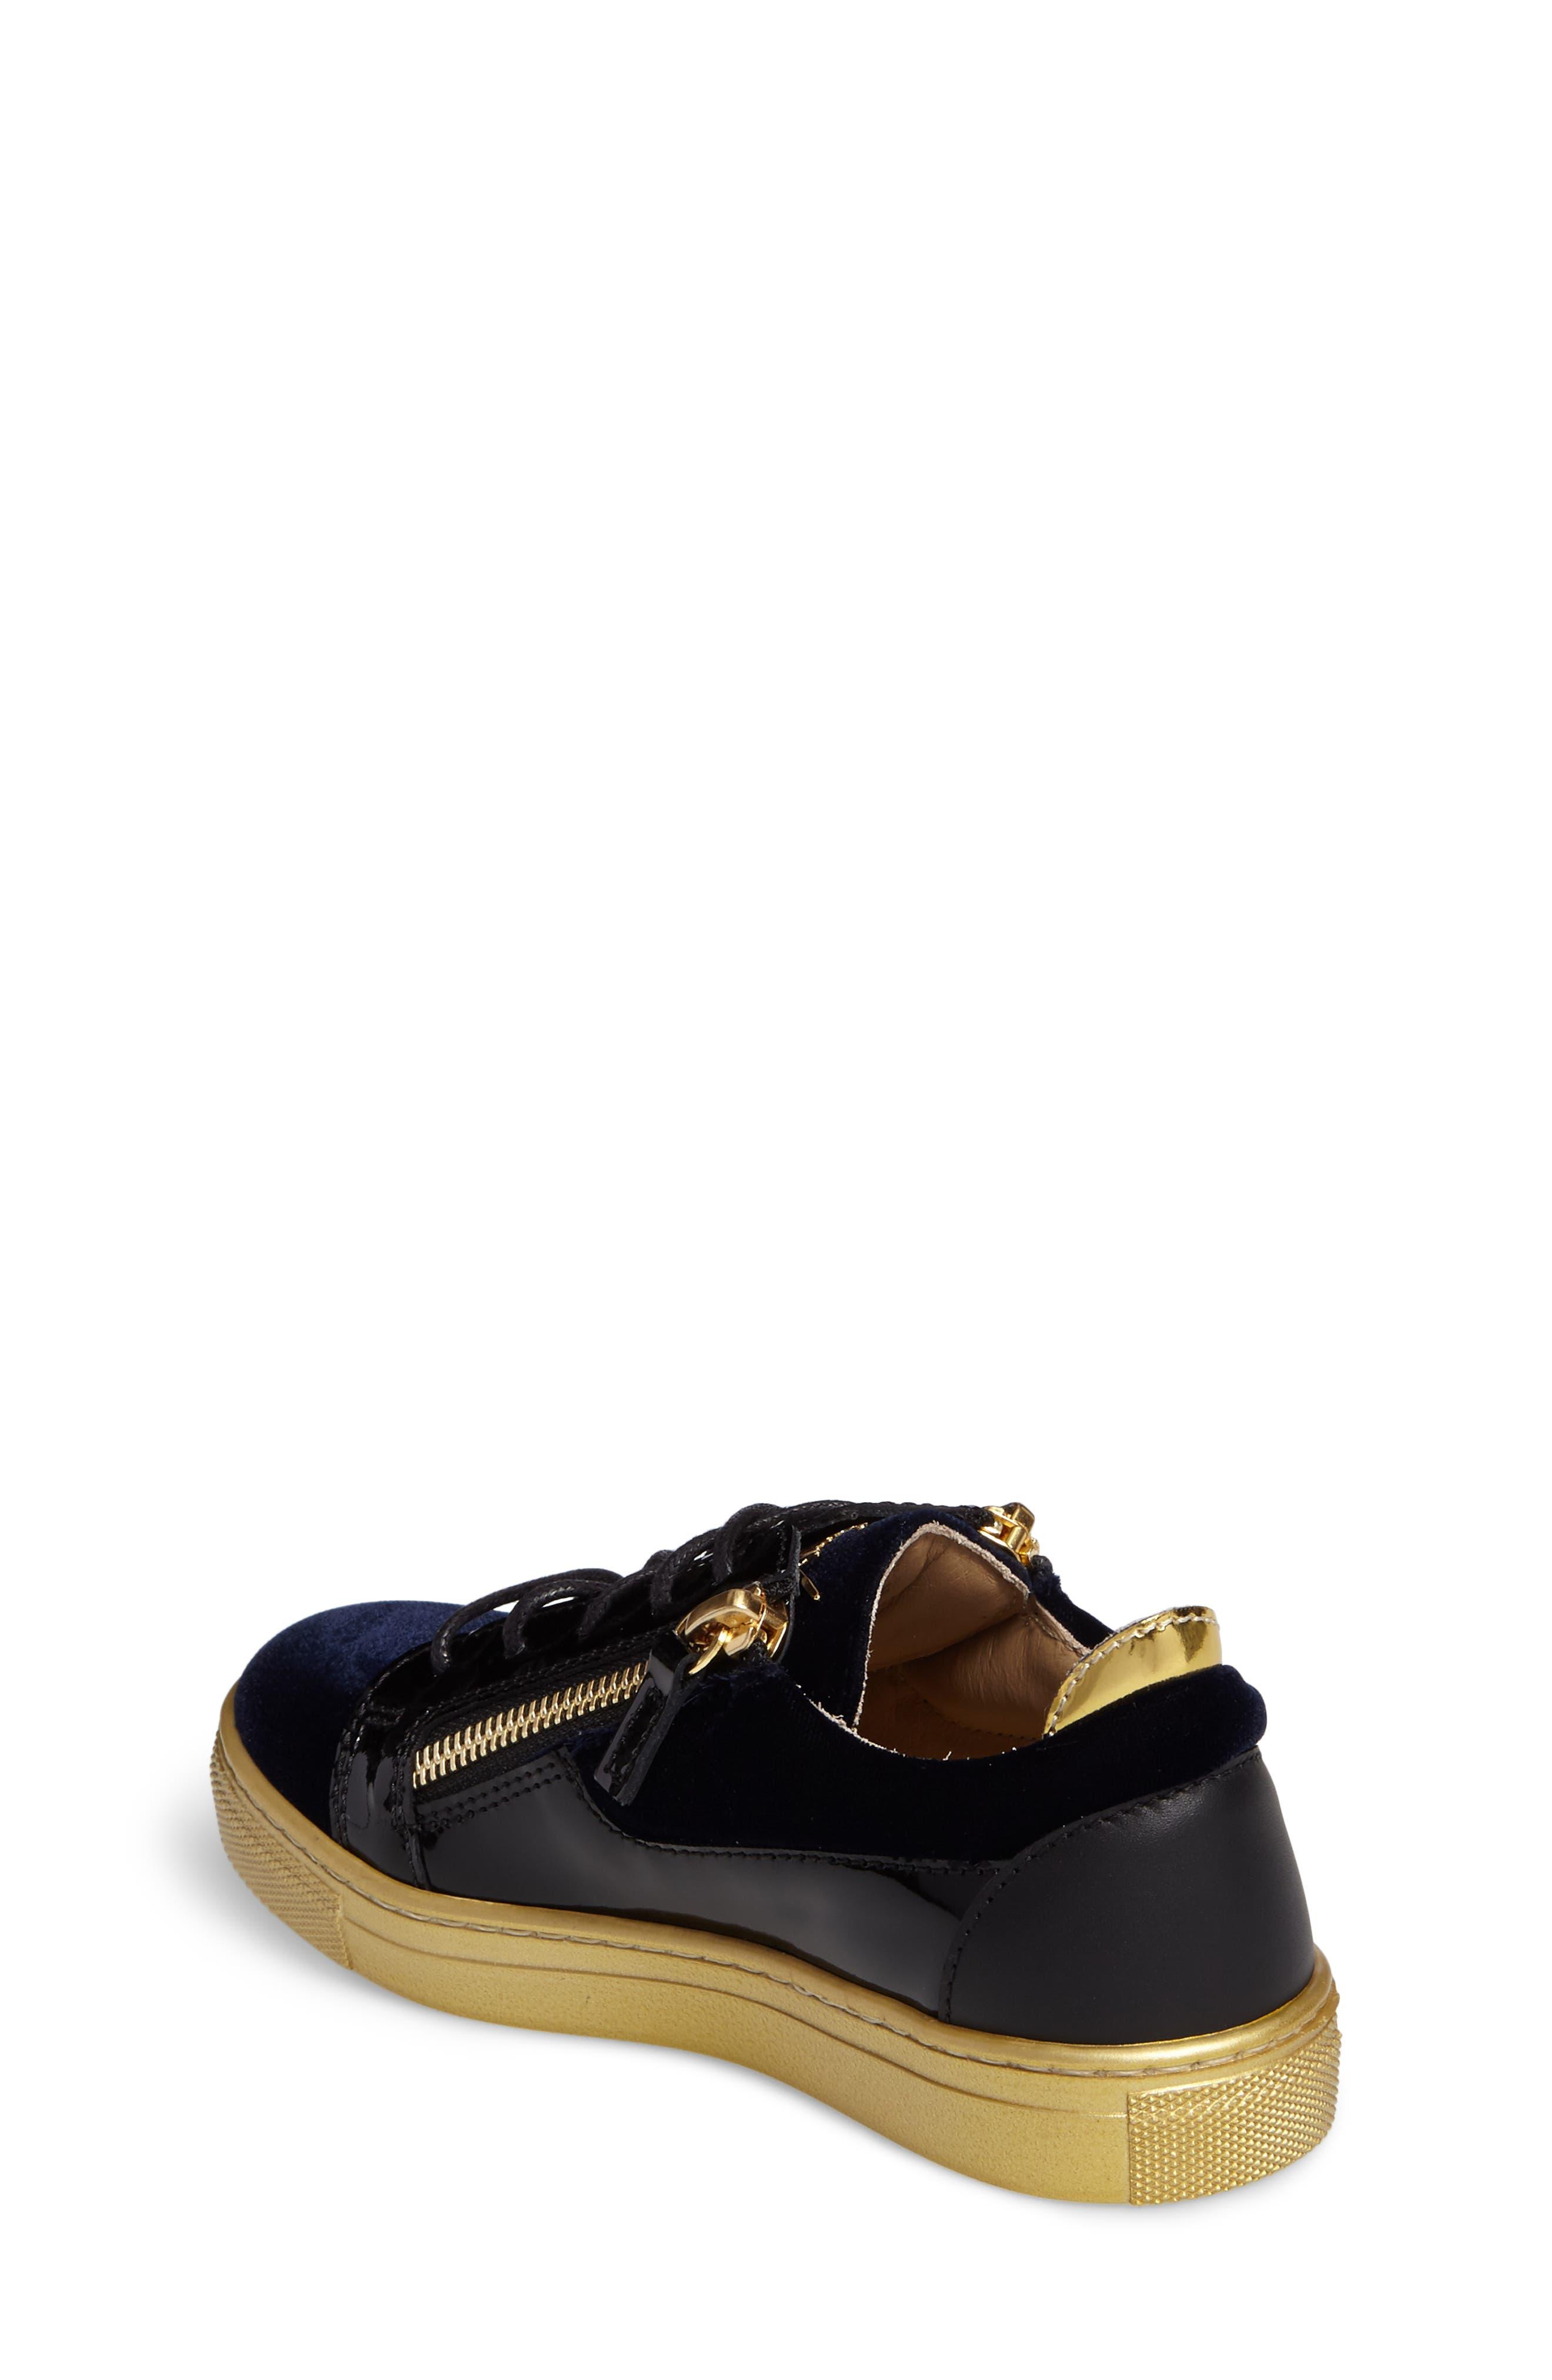 London Sneaker,                             Alternate thumbnail 2, color,                             400